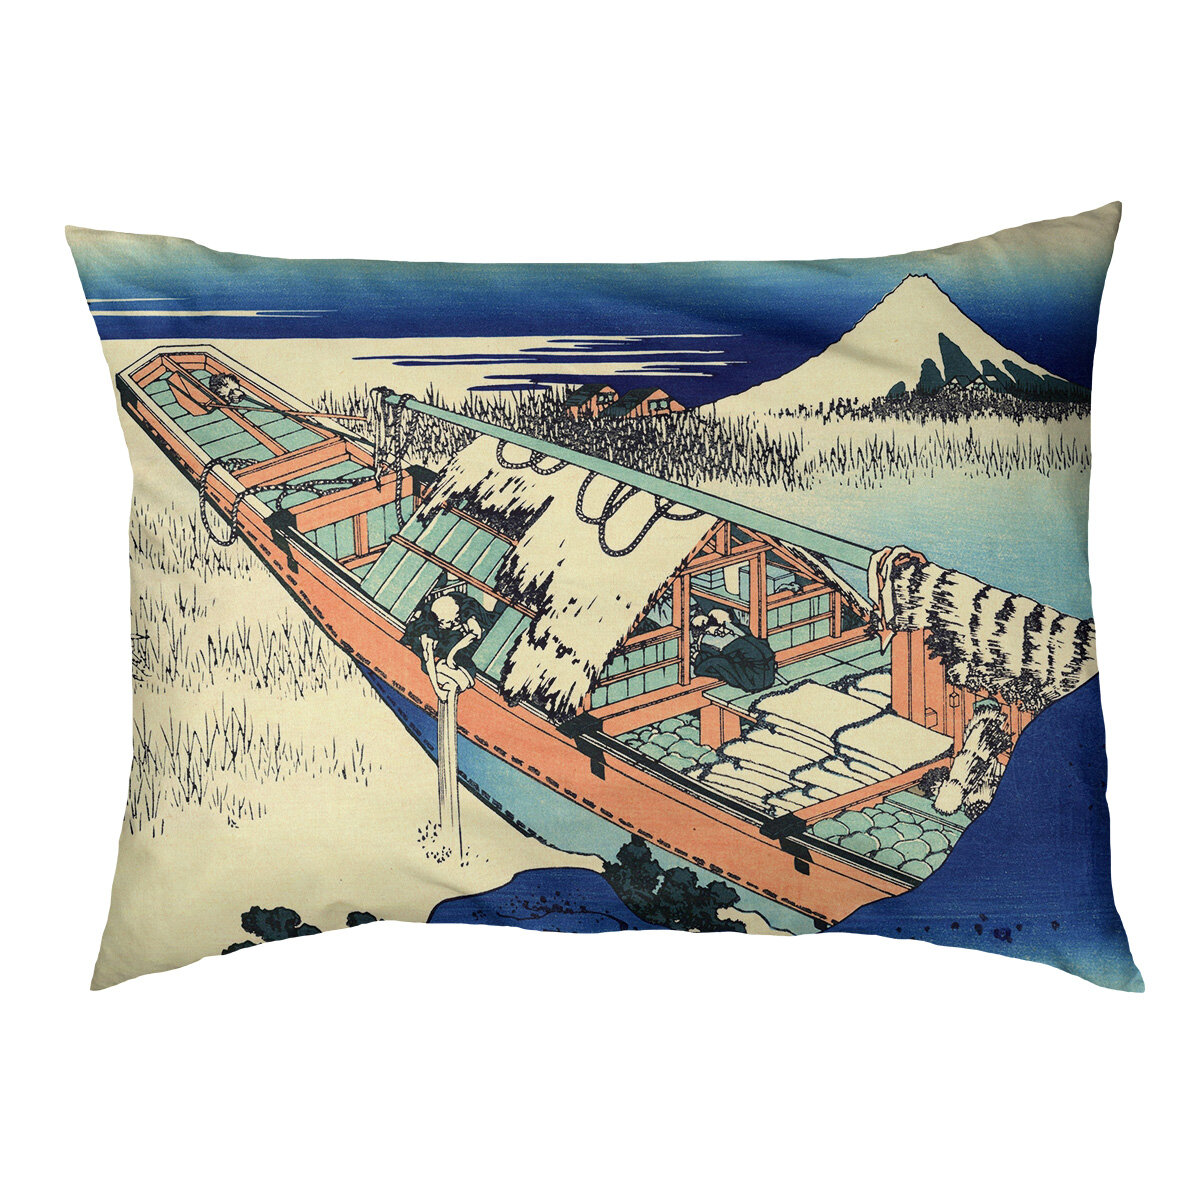 Tucker Murphy Pet Burkart Ushibori In Hitachi Province Indoor Outdoor Dog Pillow Classic Wayfair